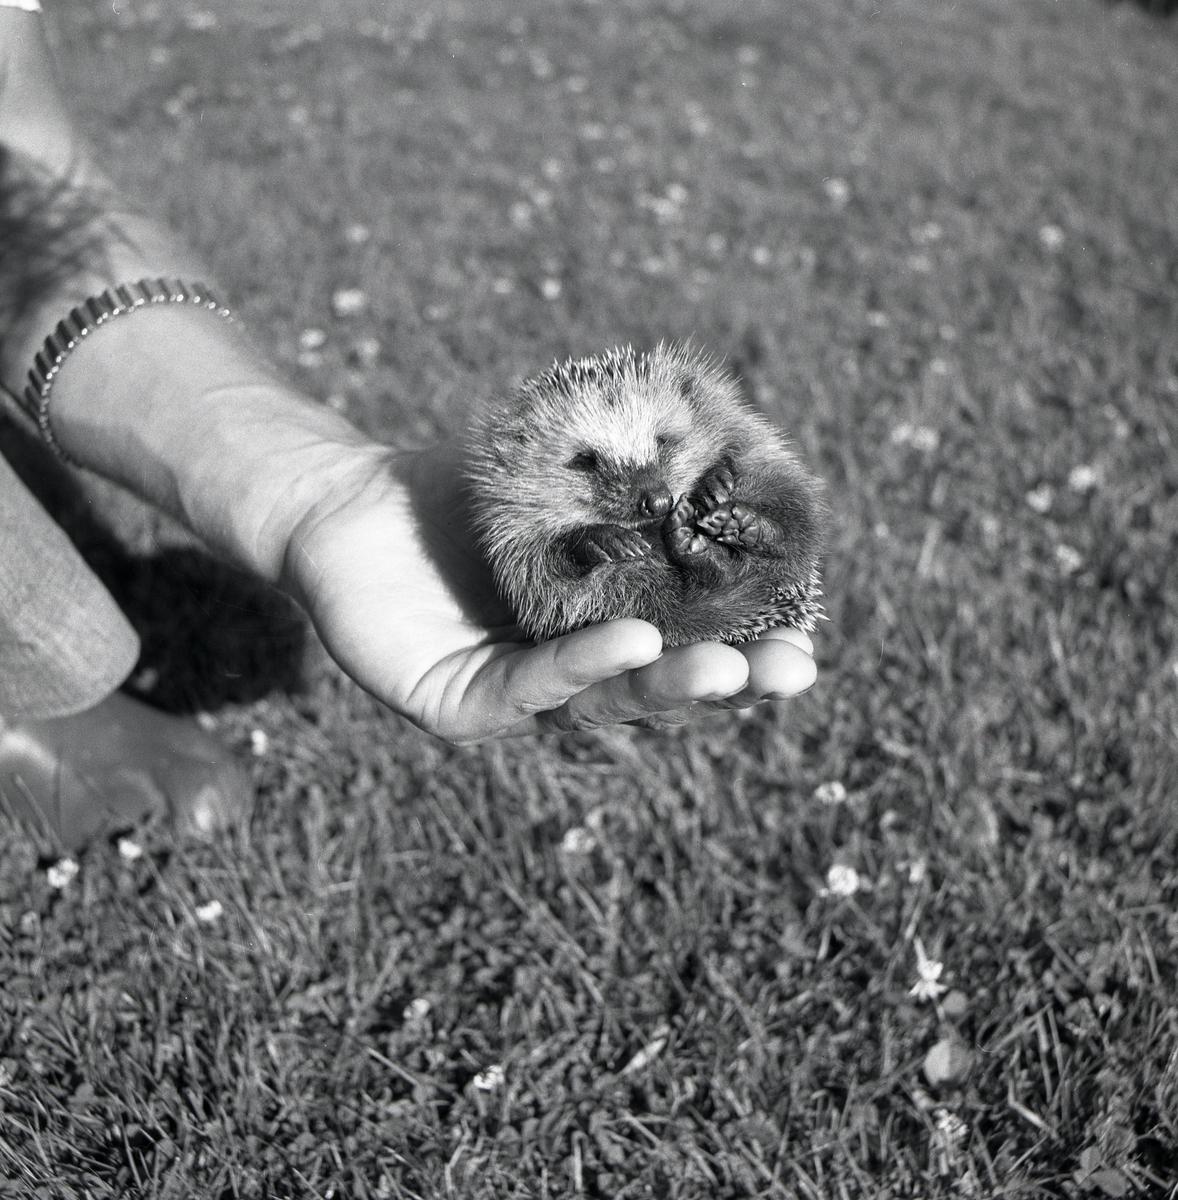 En person håller en igelkott i sin hand, juli 1975.